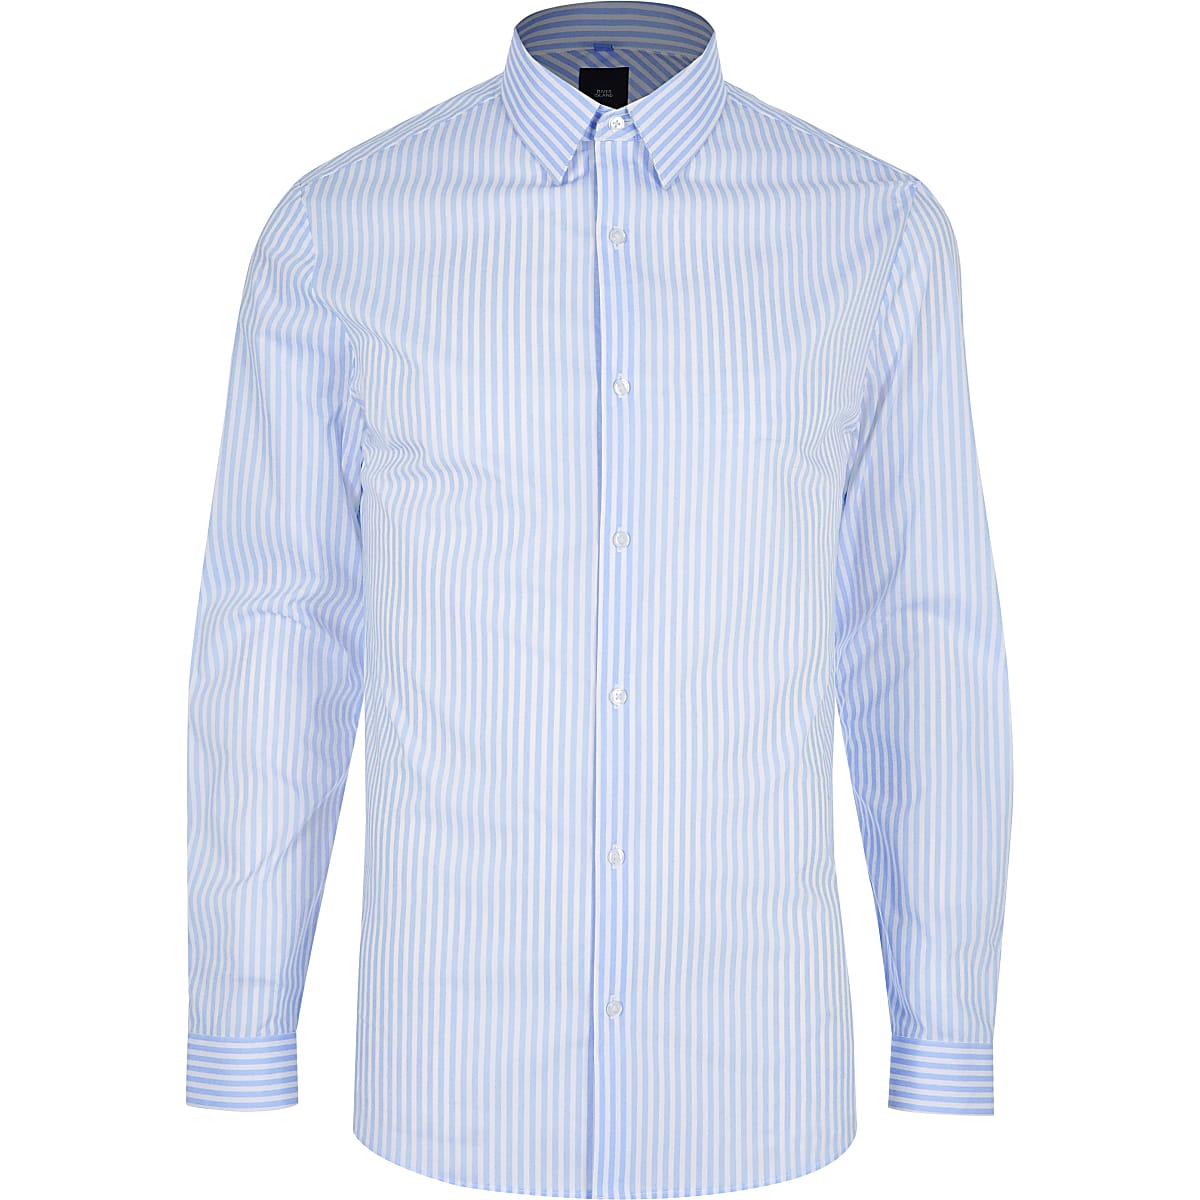 Blue stripe muscle fit shirt